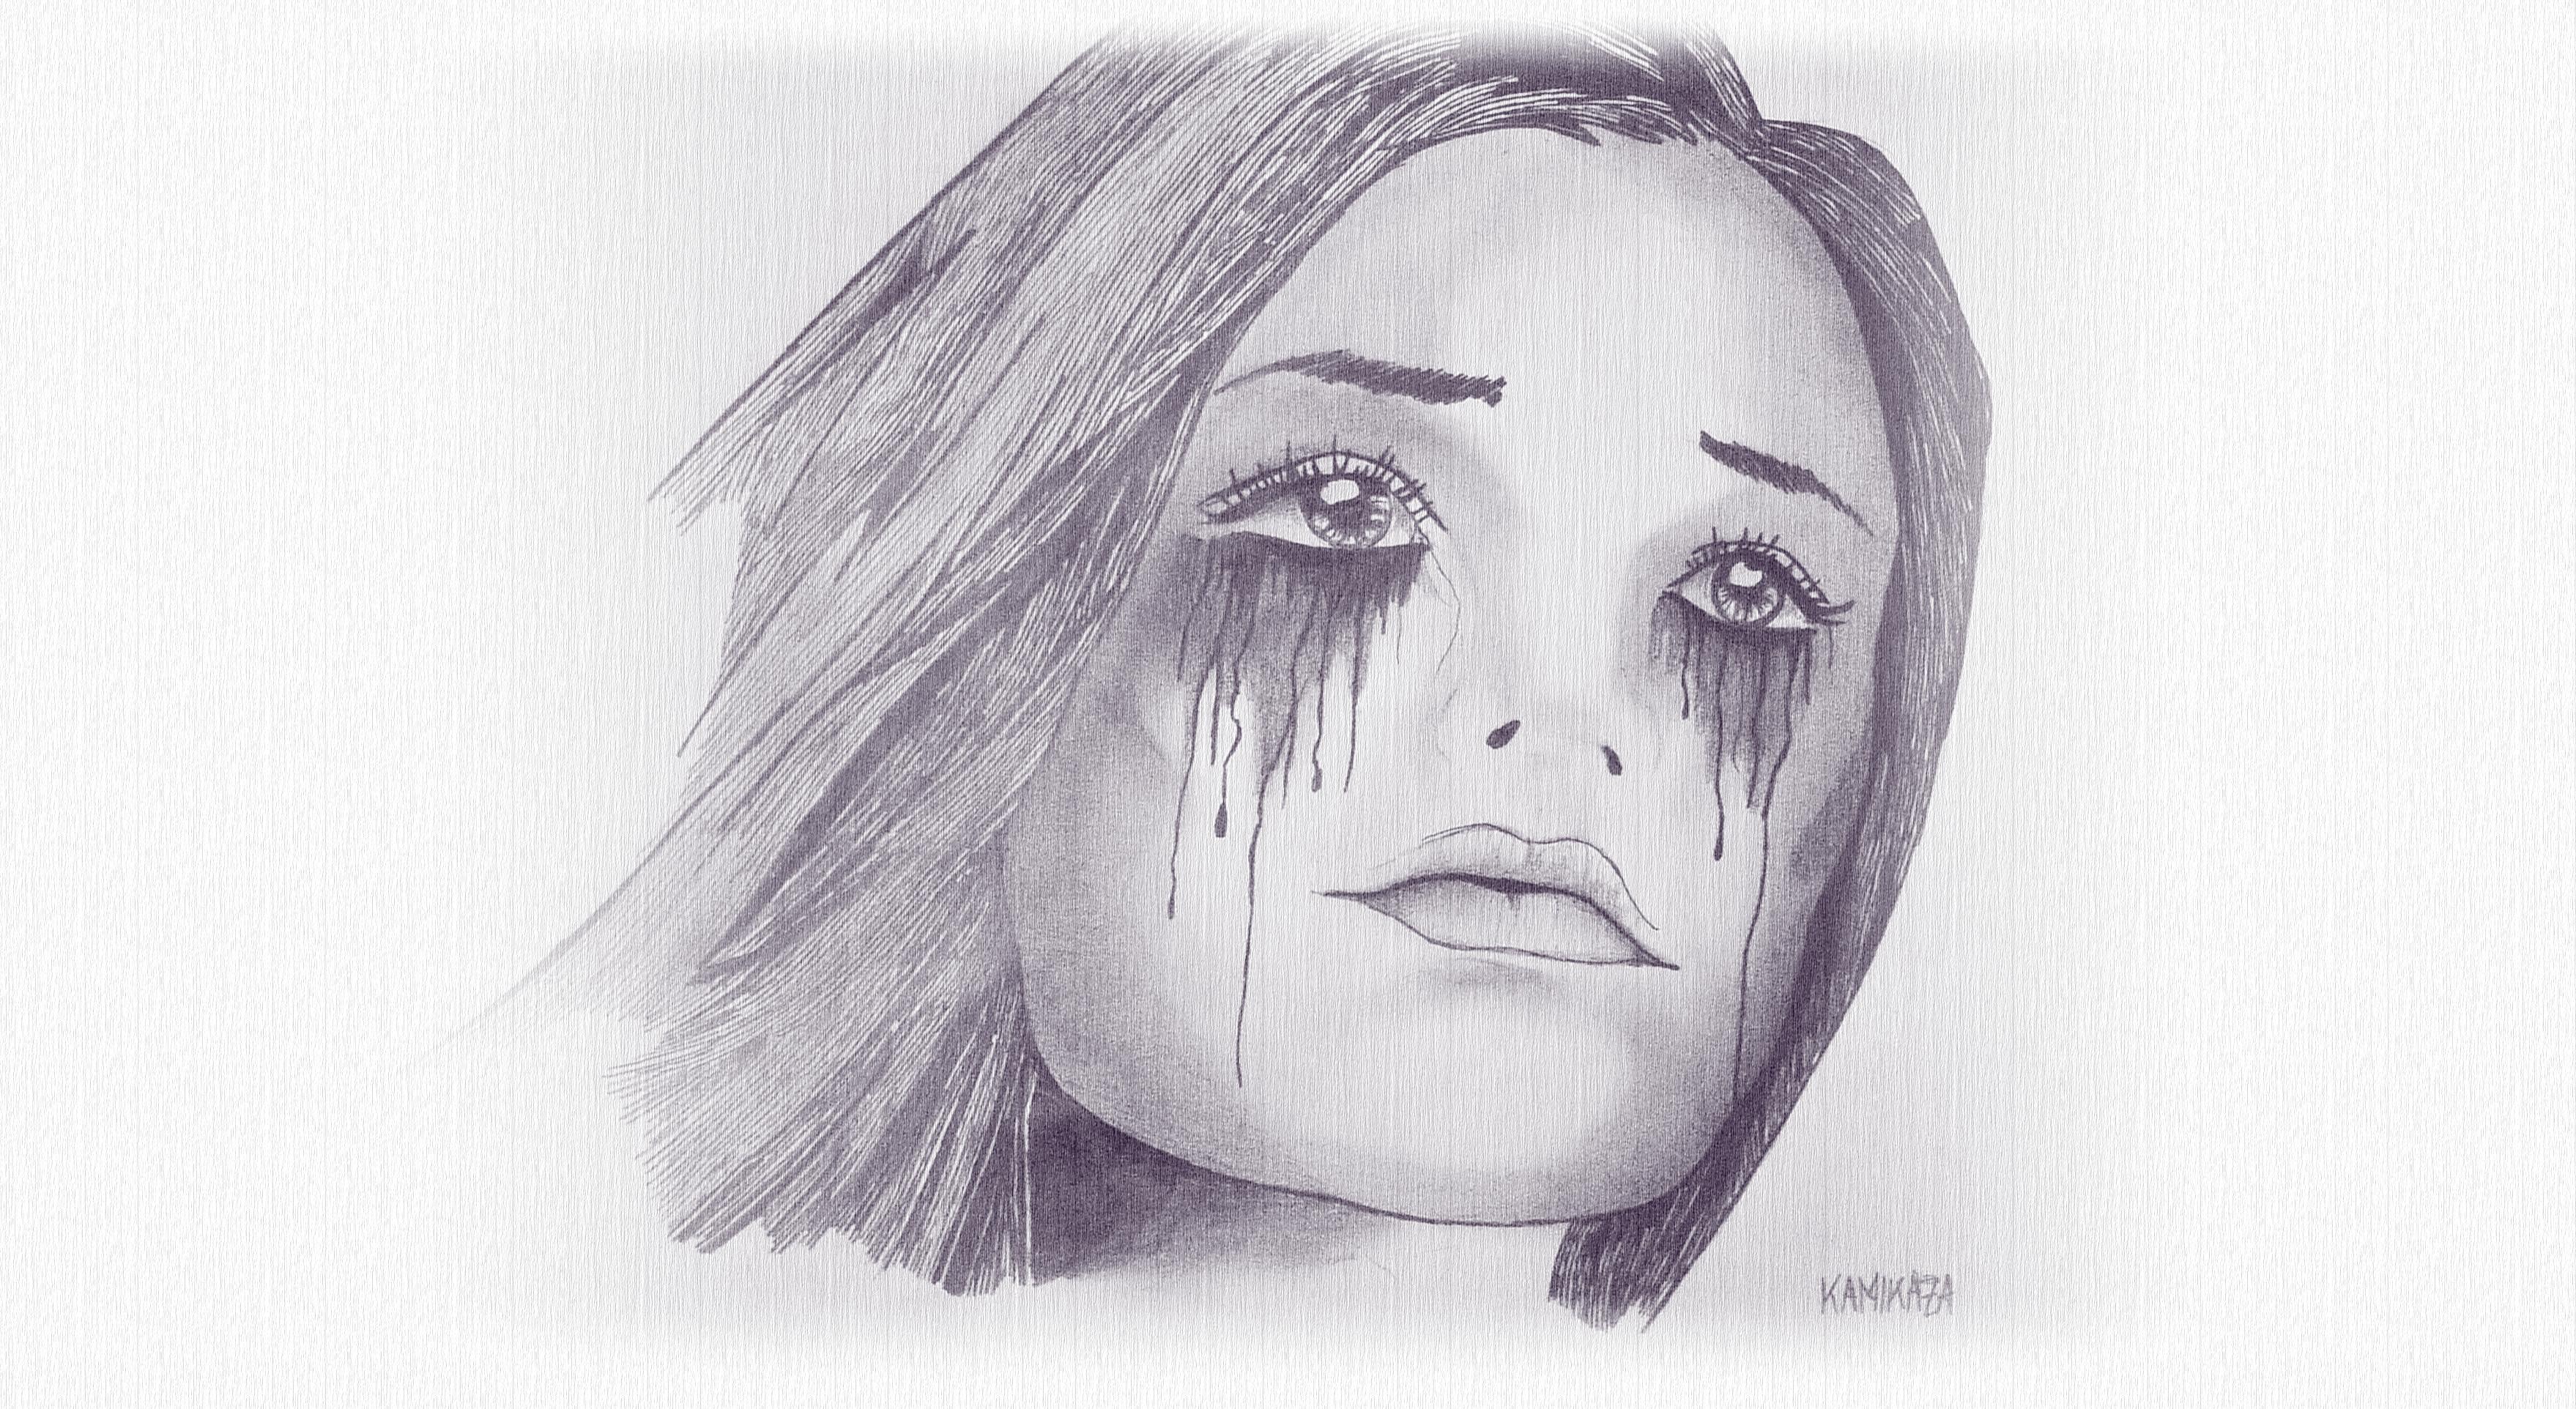 depression drawings tumblr - photo #42